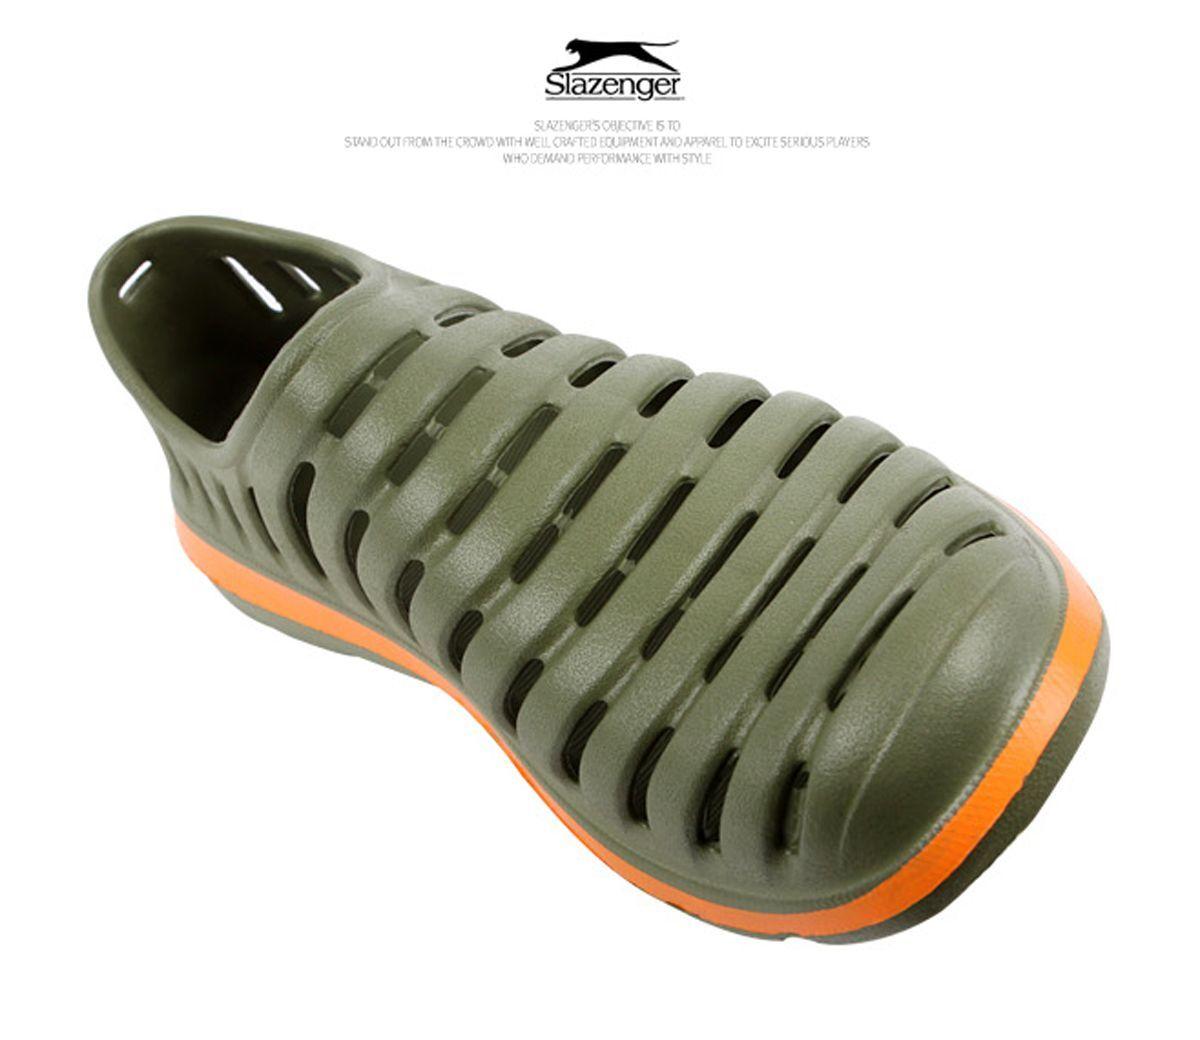 Slazenger MensBarefoot Shoes Aqua shoes size7~10 Athletic Shoes Rubber Sneakers size7~10 shoes 474051